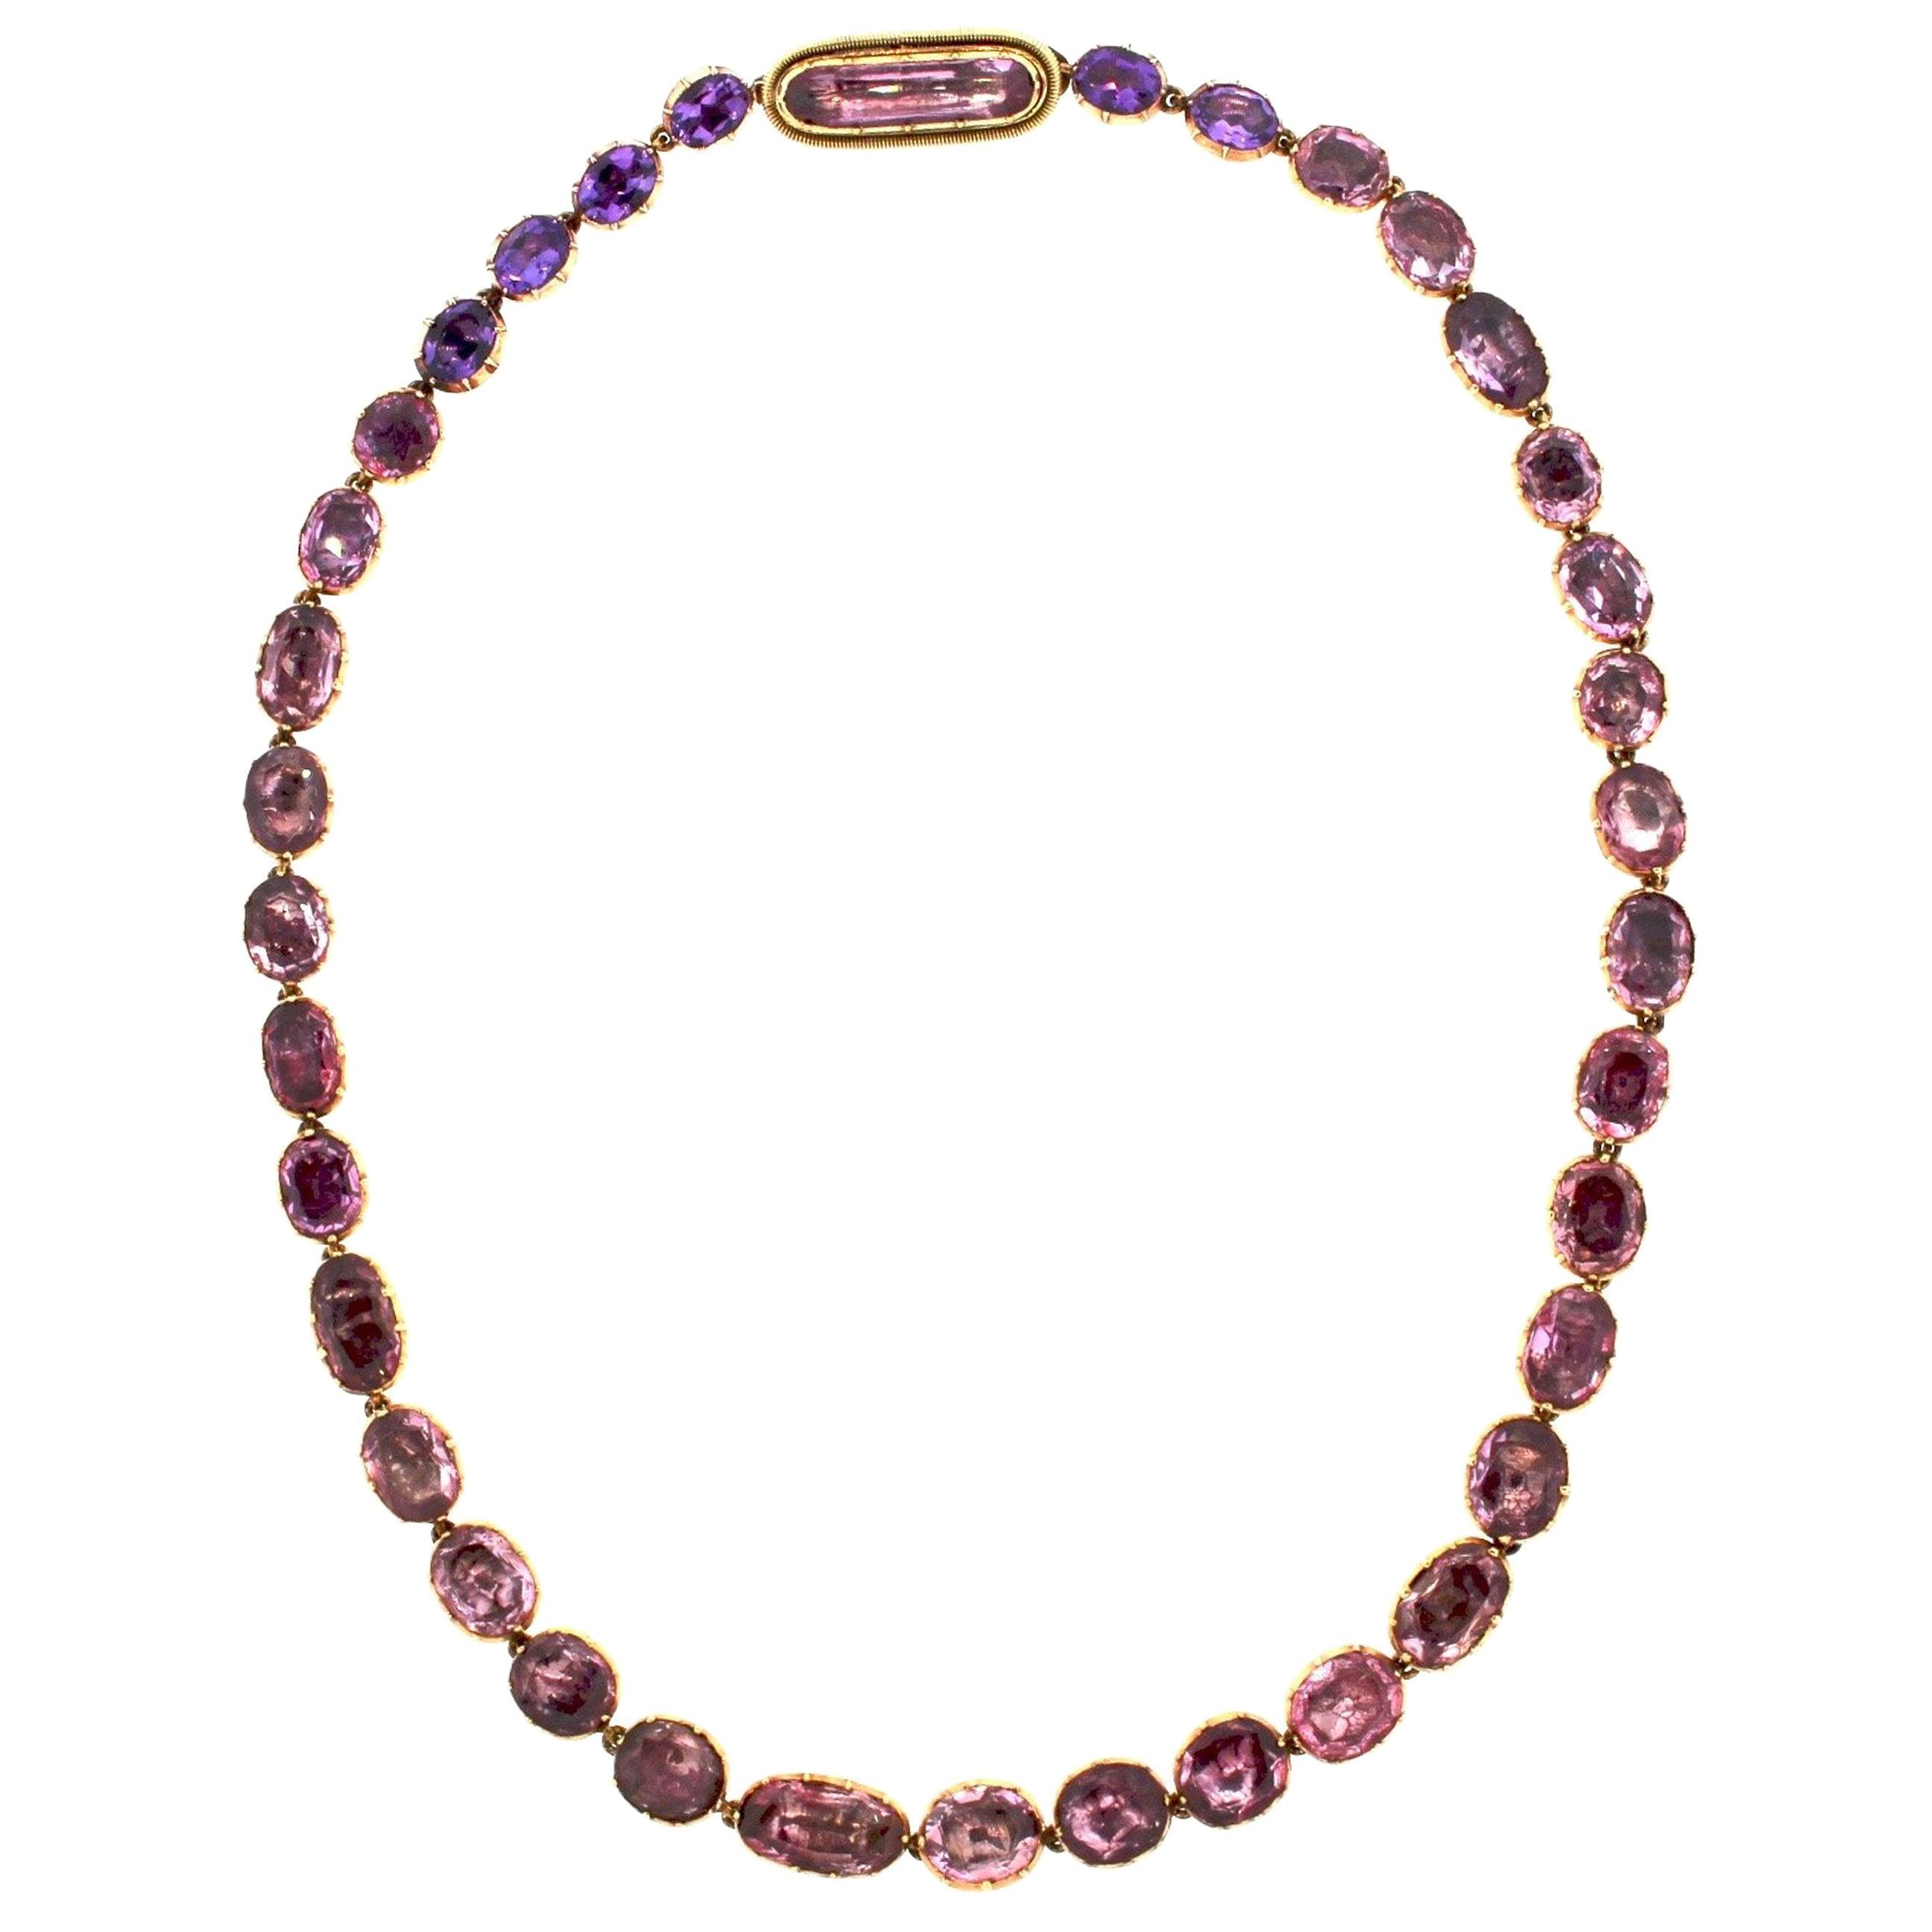 Antique Georgian Gold Pink Topaz Foil Back Riviere Necklace